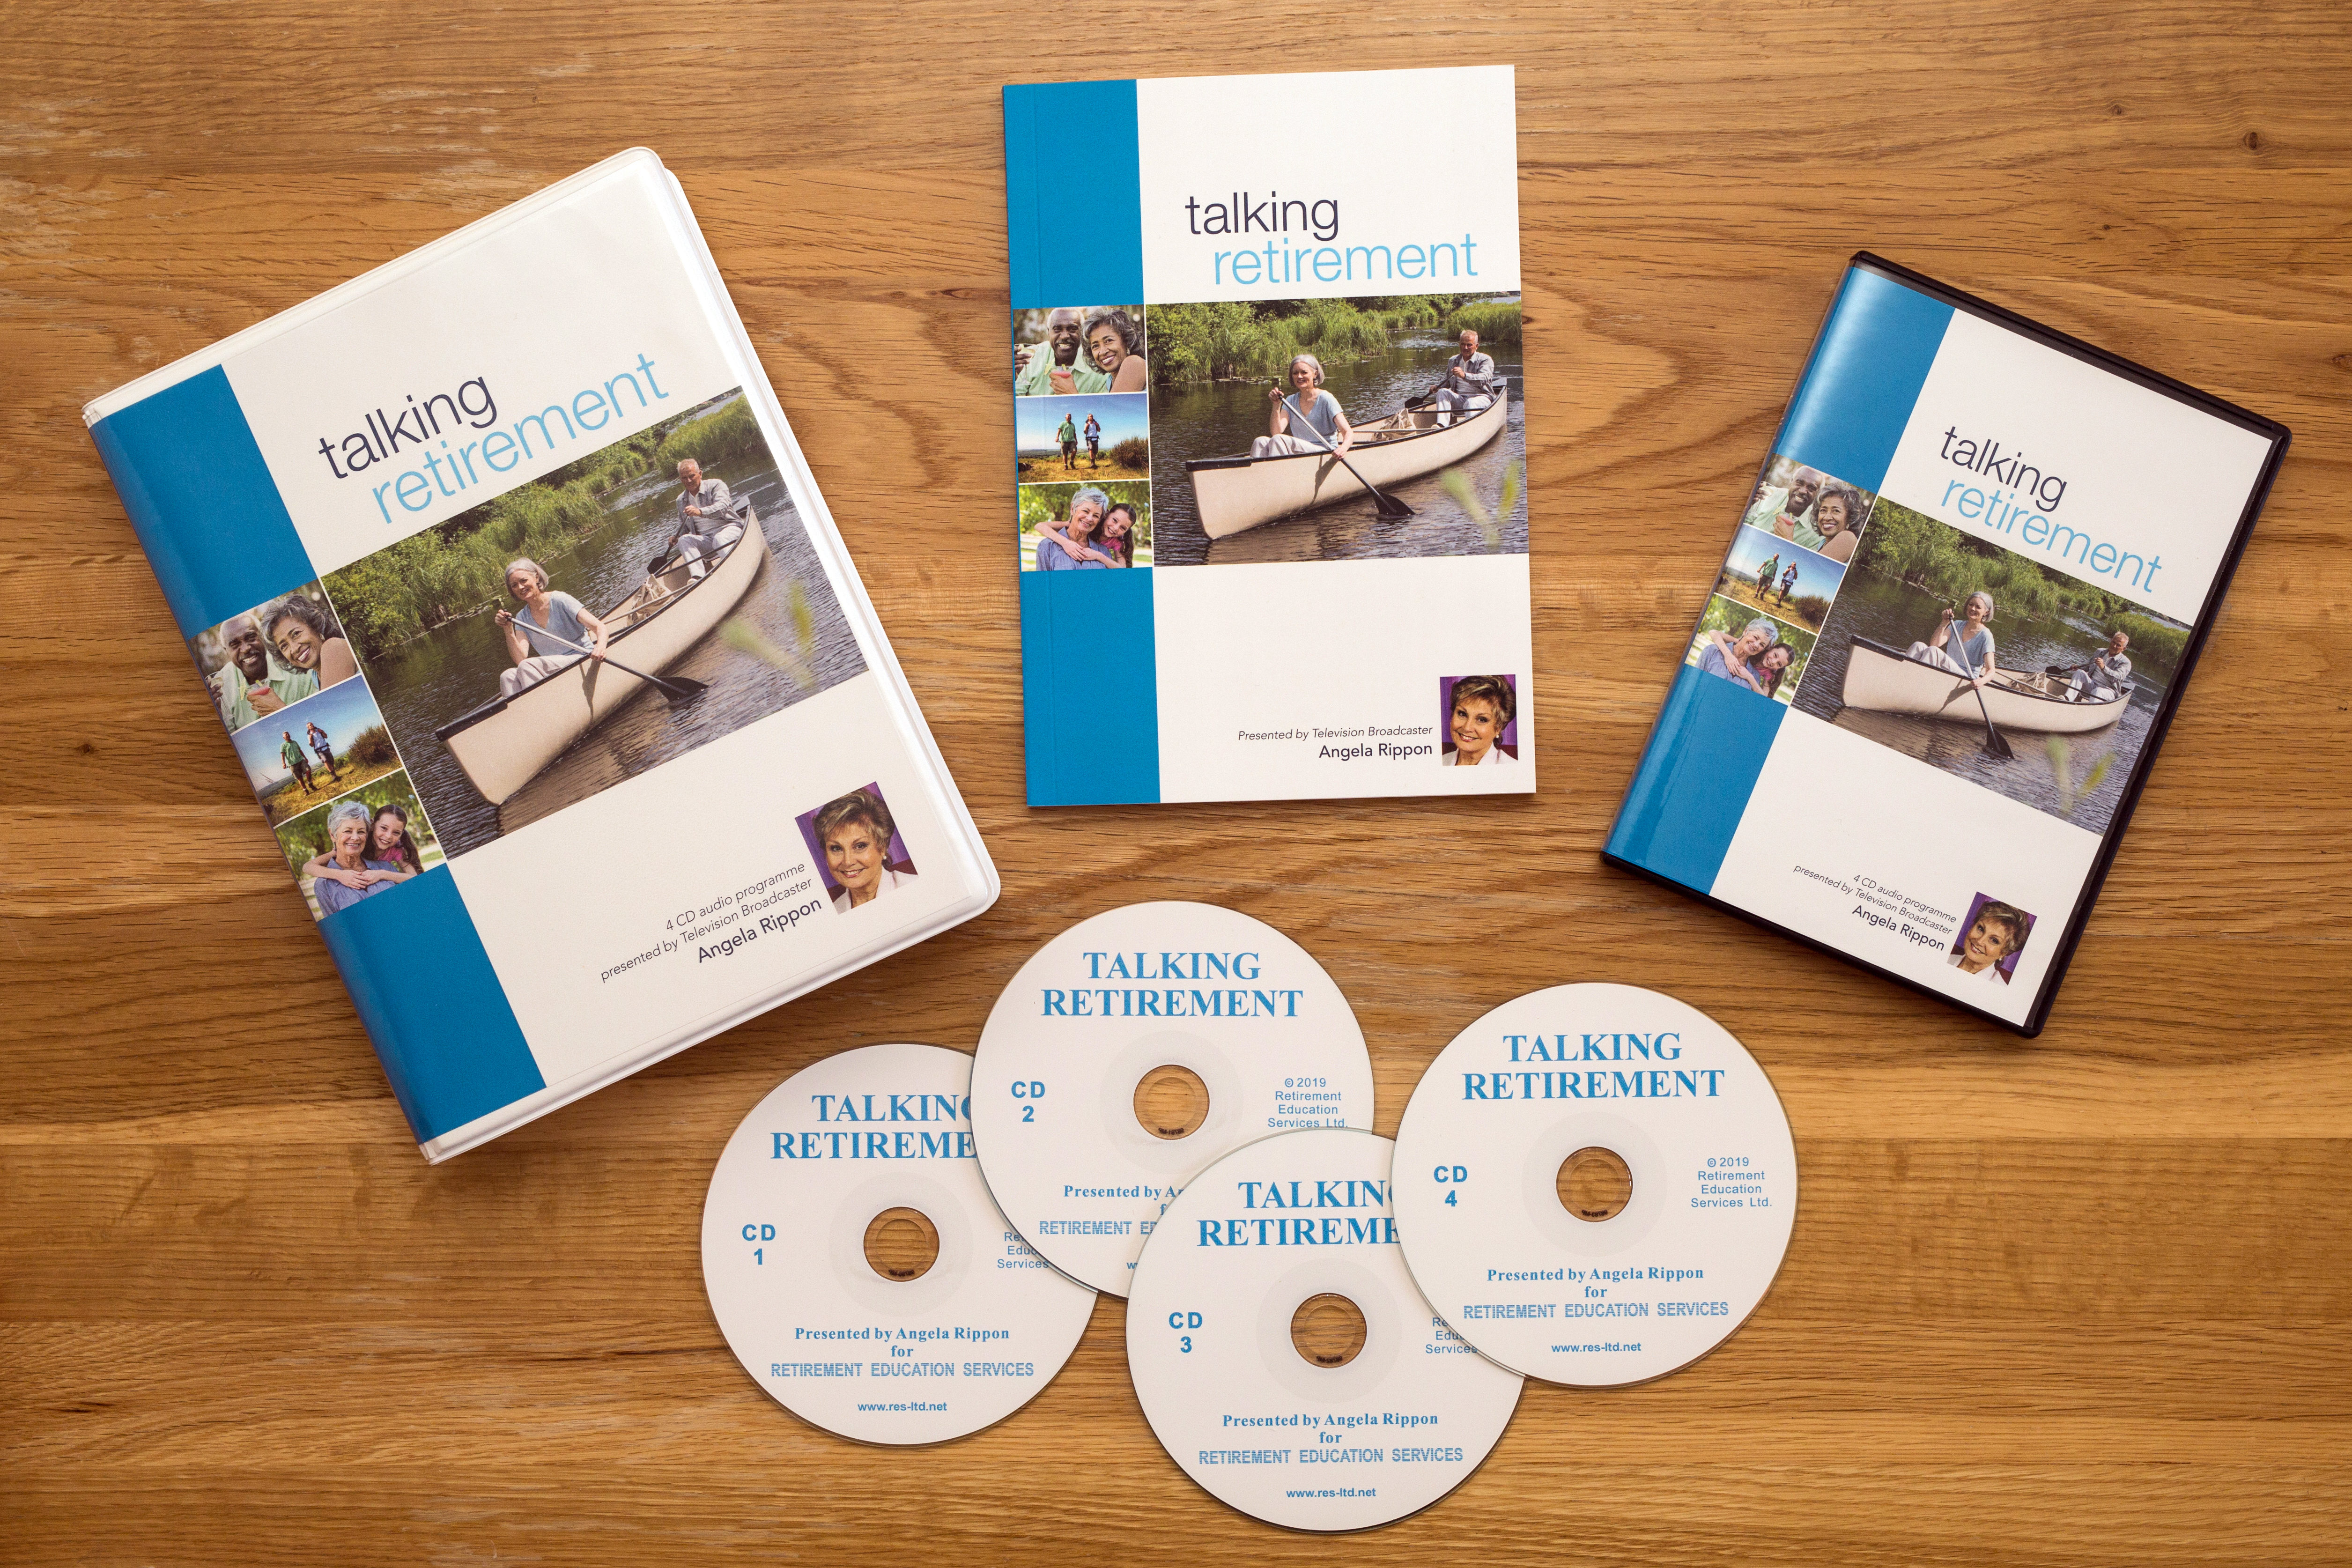 Talking Retirement CD audio package